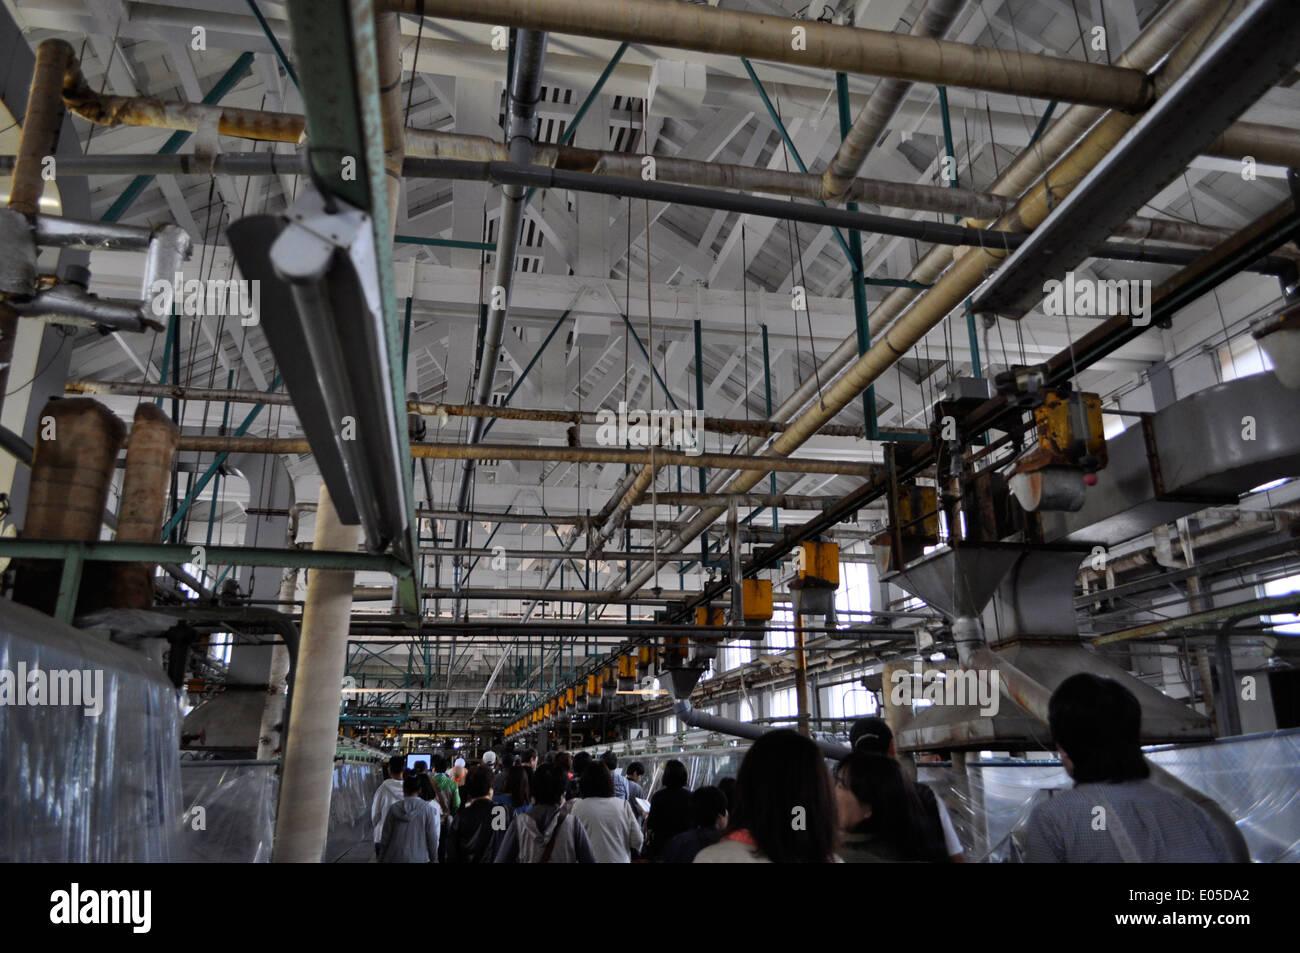 Tomioka seishijo Tomioka Silk mill,Tomioka,Gunma,Japan Stock Photo, Royalty F...